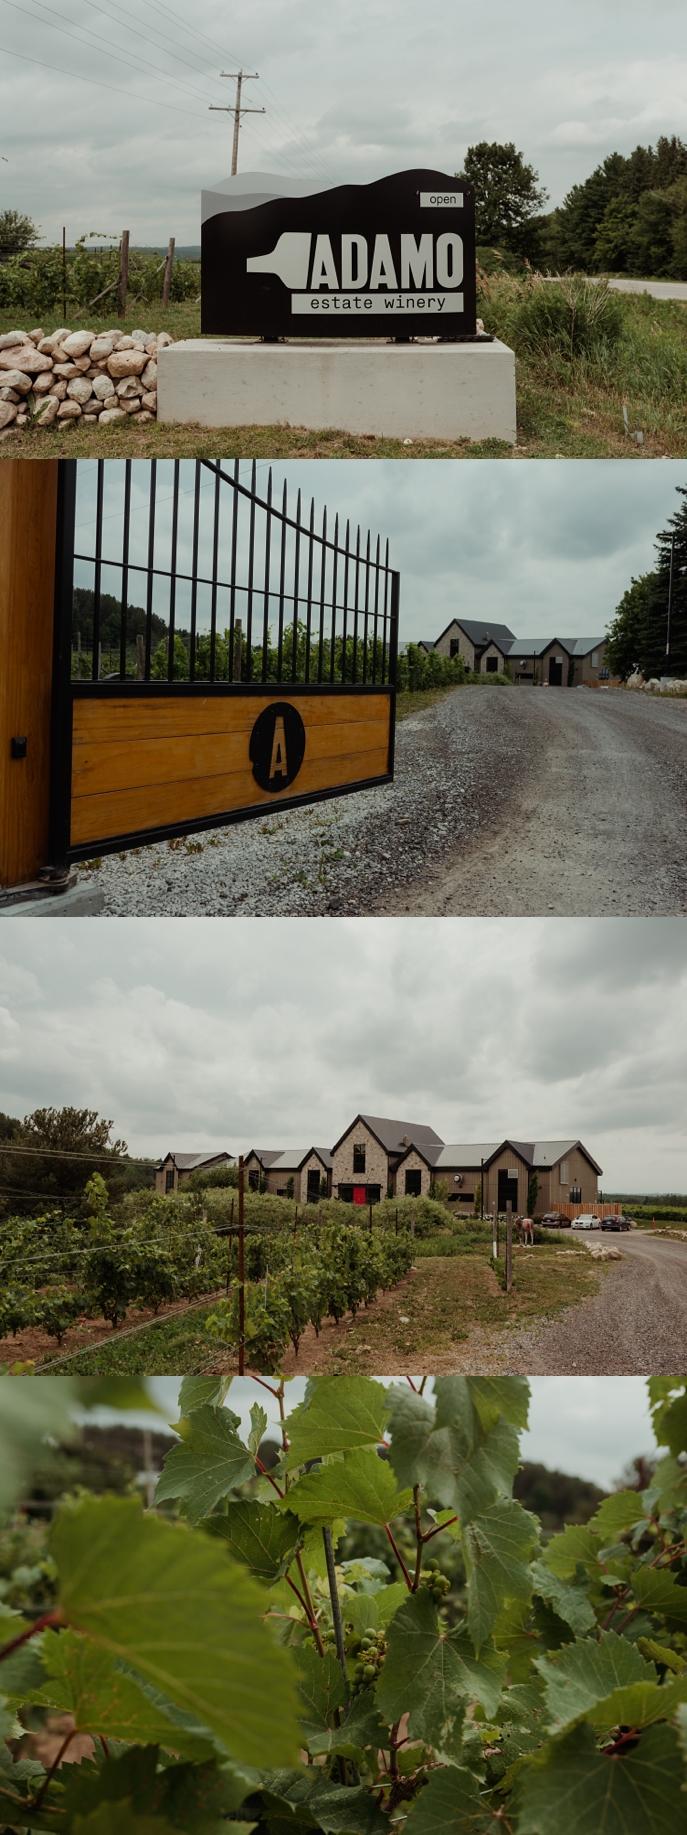 Adamo-estate-winery-hockley-wedding-312-6.jpg